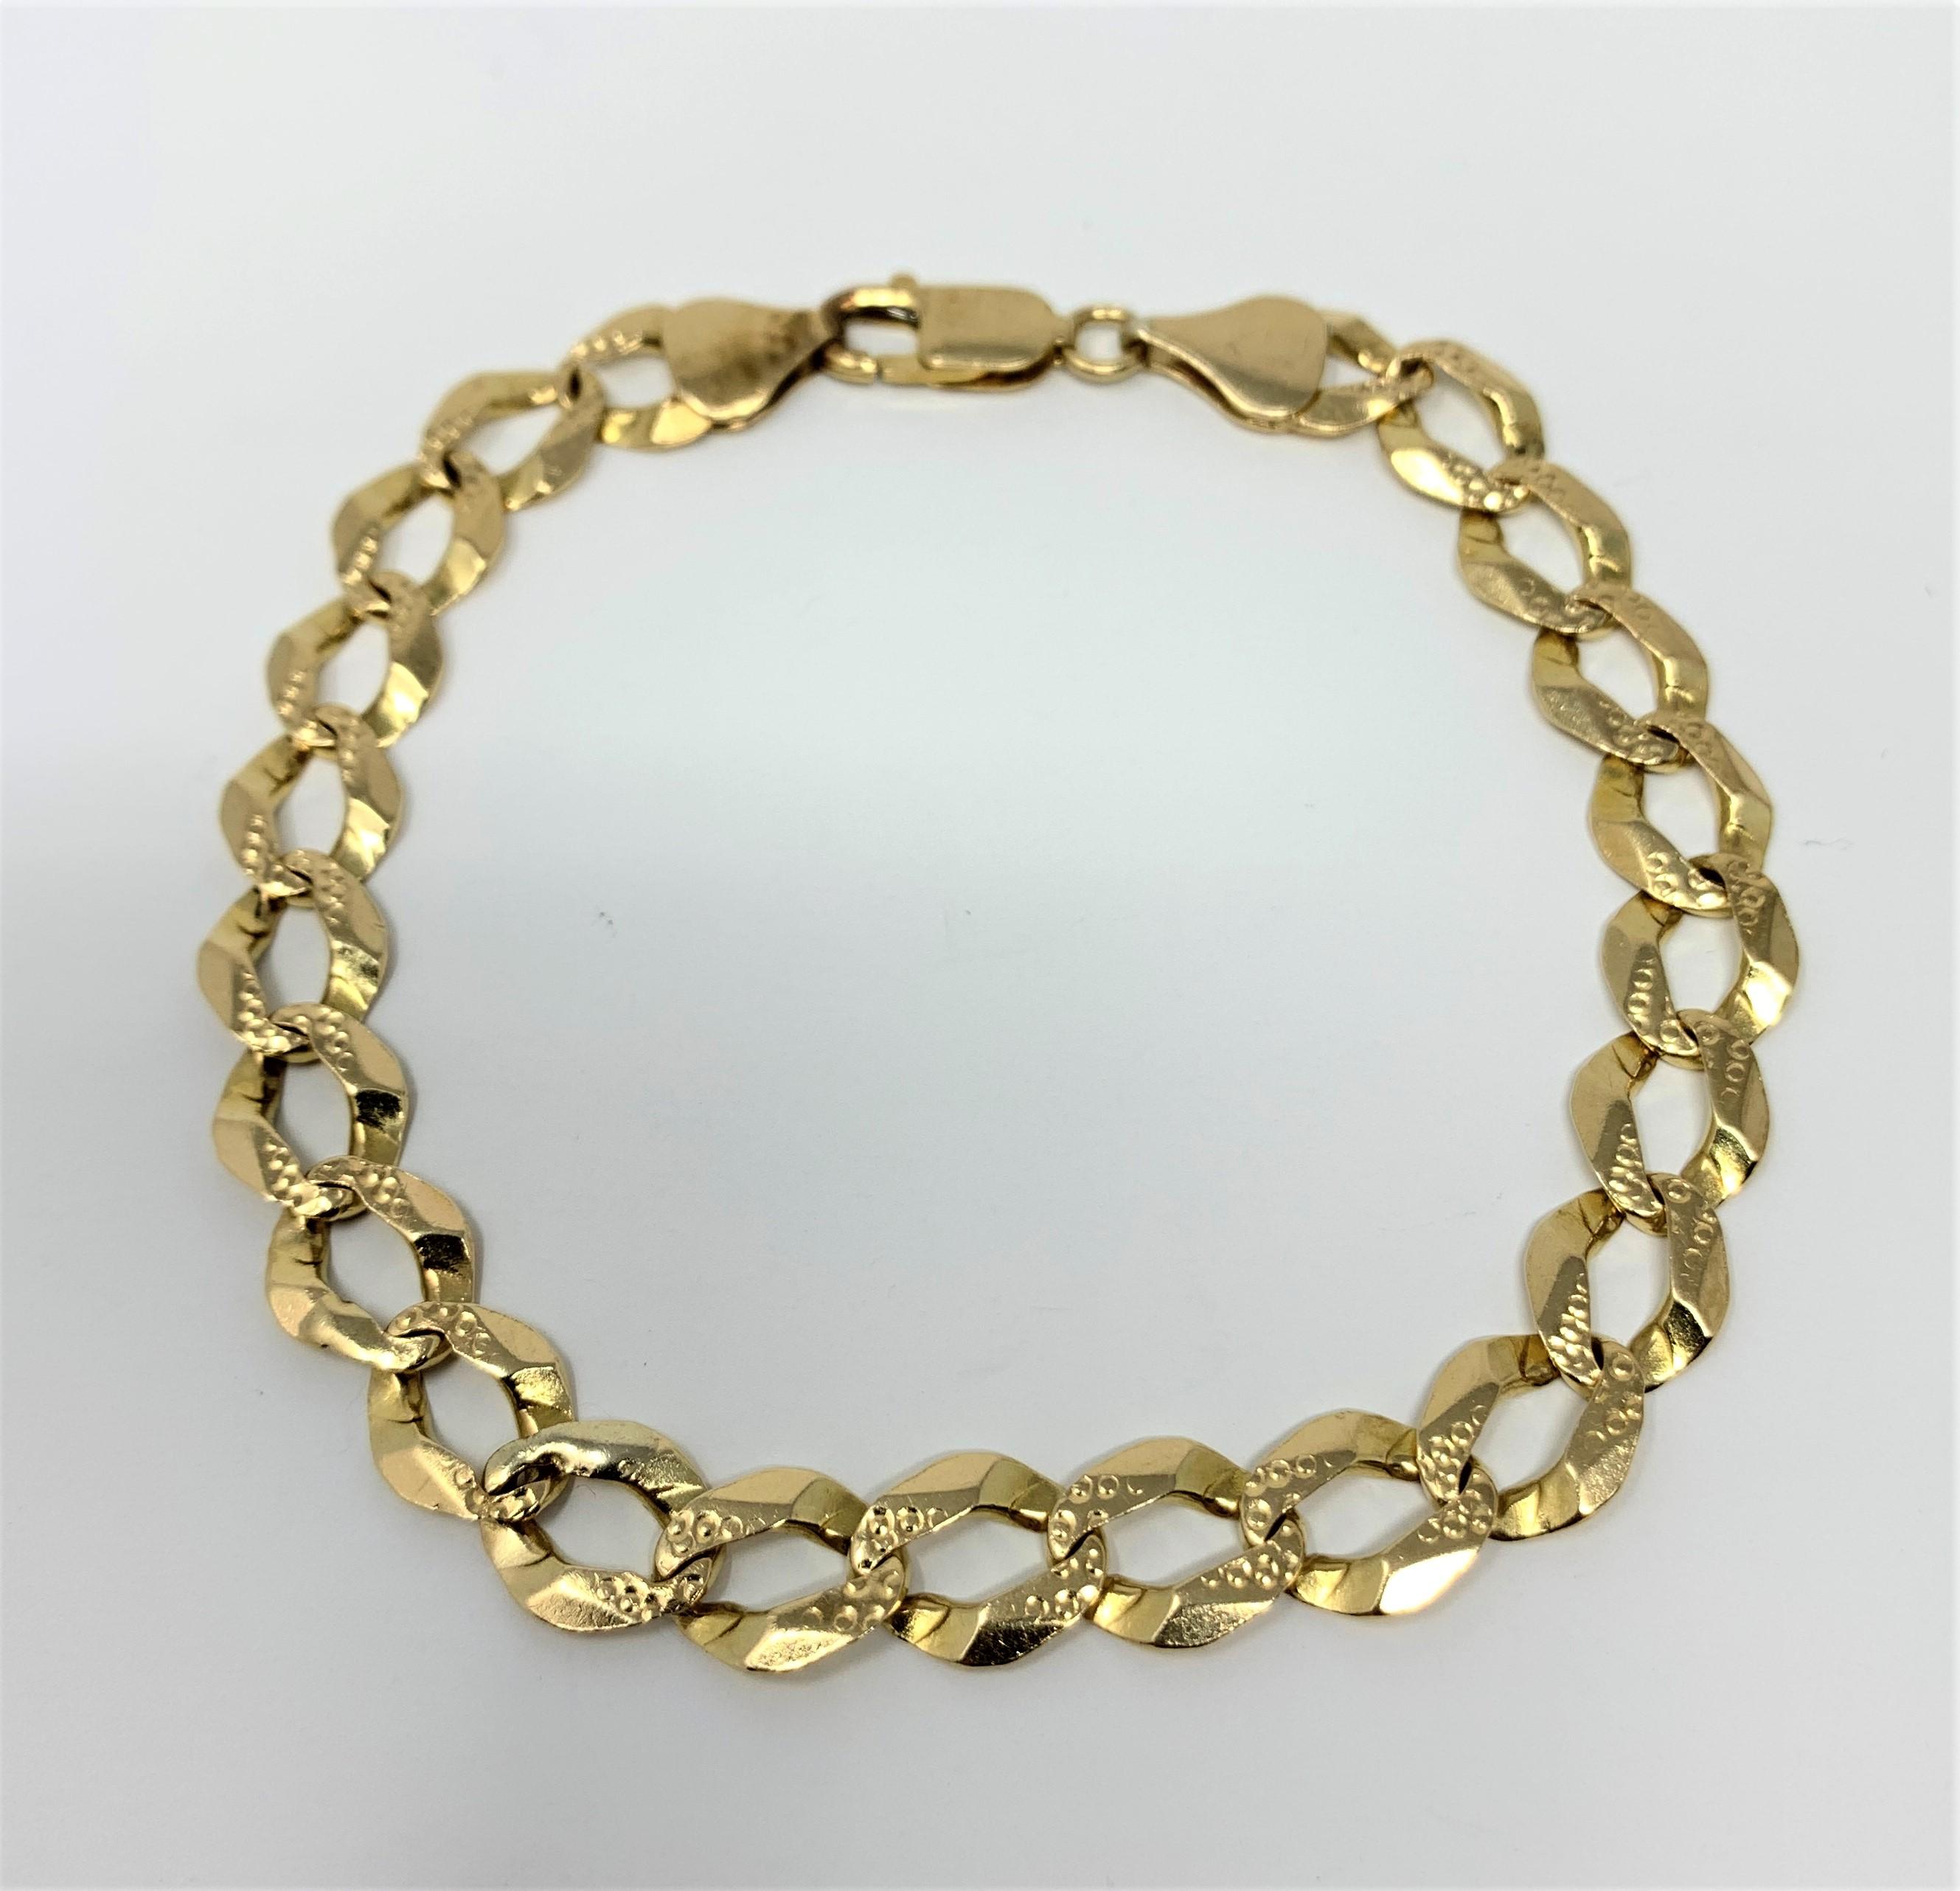 3858c43f2c4cd 14k Yellow Gold Curb Link Bracelet At Truefacet. Men S Curb Link Bracelet  10k Yellow Gold 8 ...